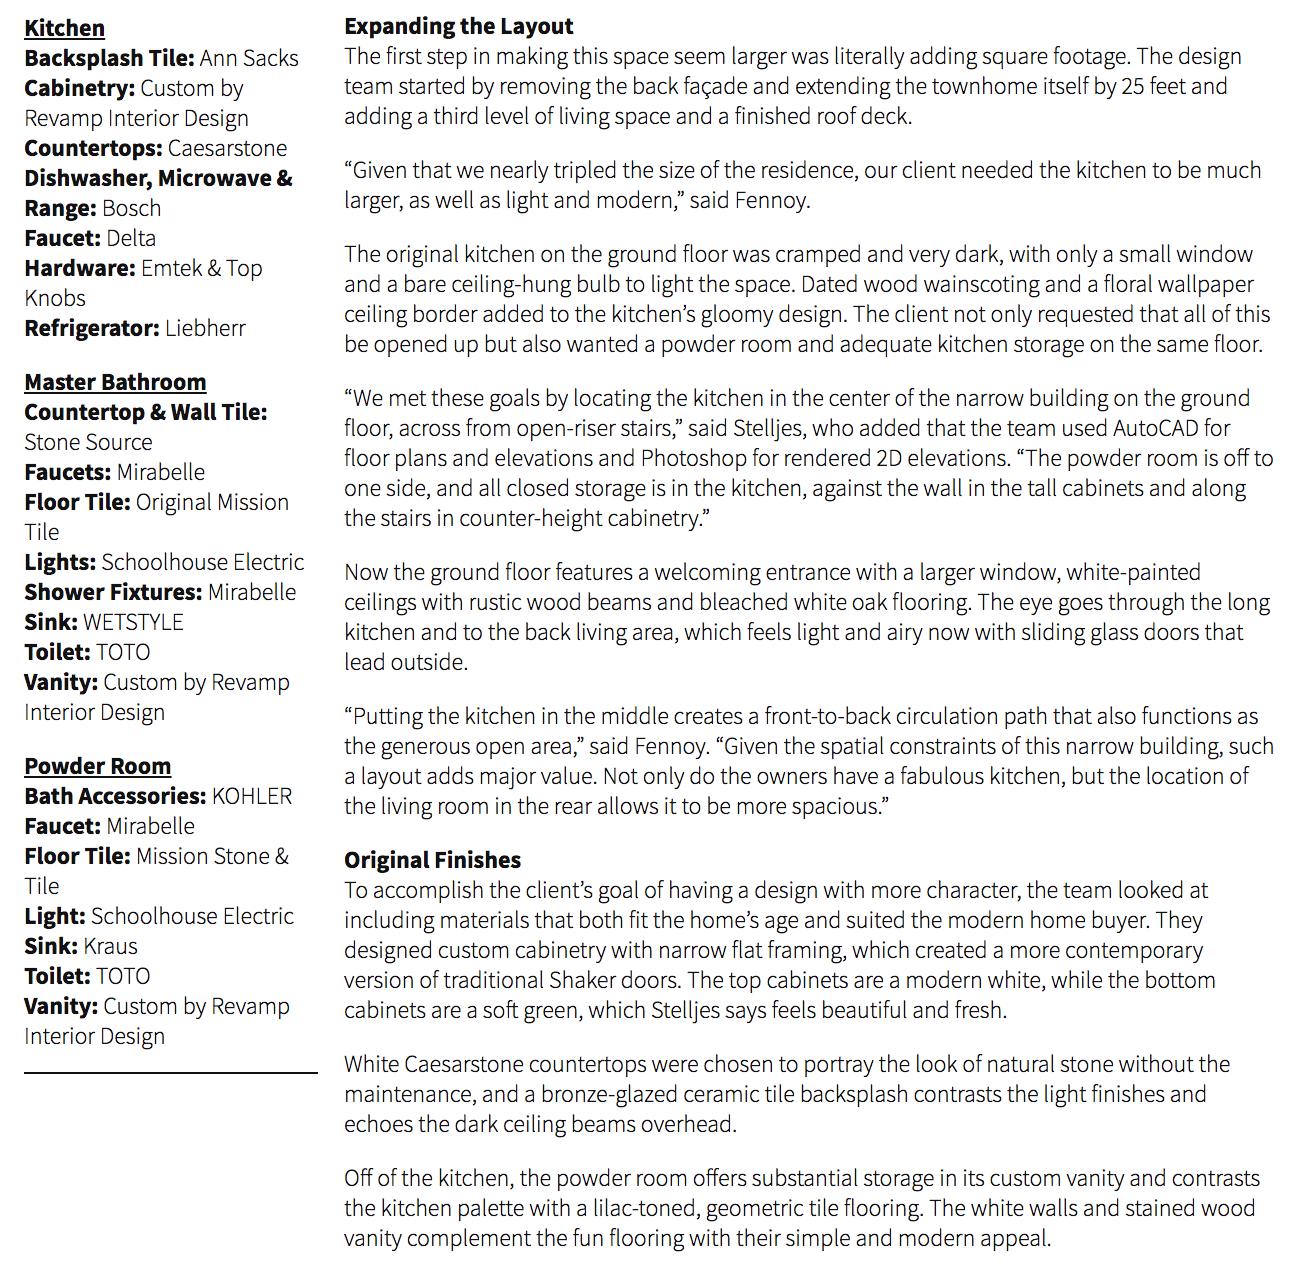 Kitchen & Bath Business - Greenpoint Townhouse - Screenshot 2.png